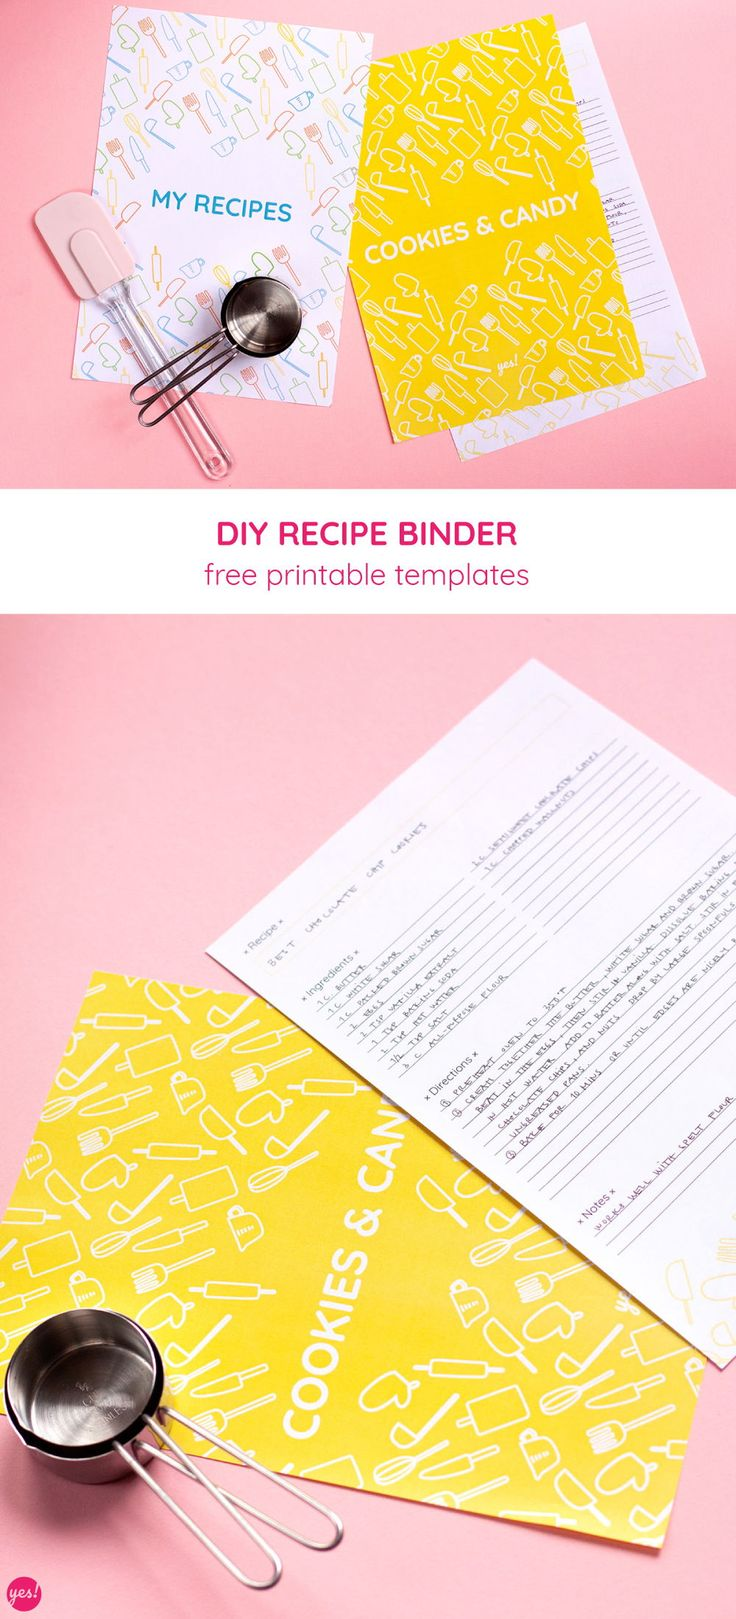 Diy recipe book with a free recipe binder printable